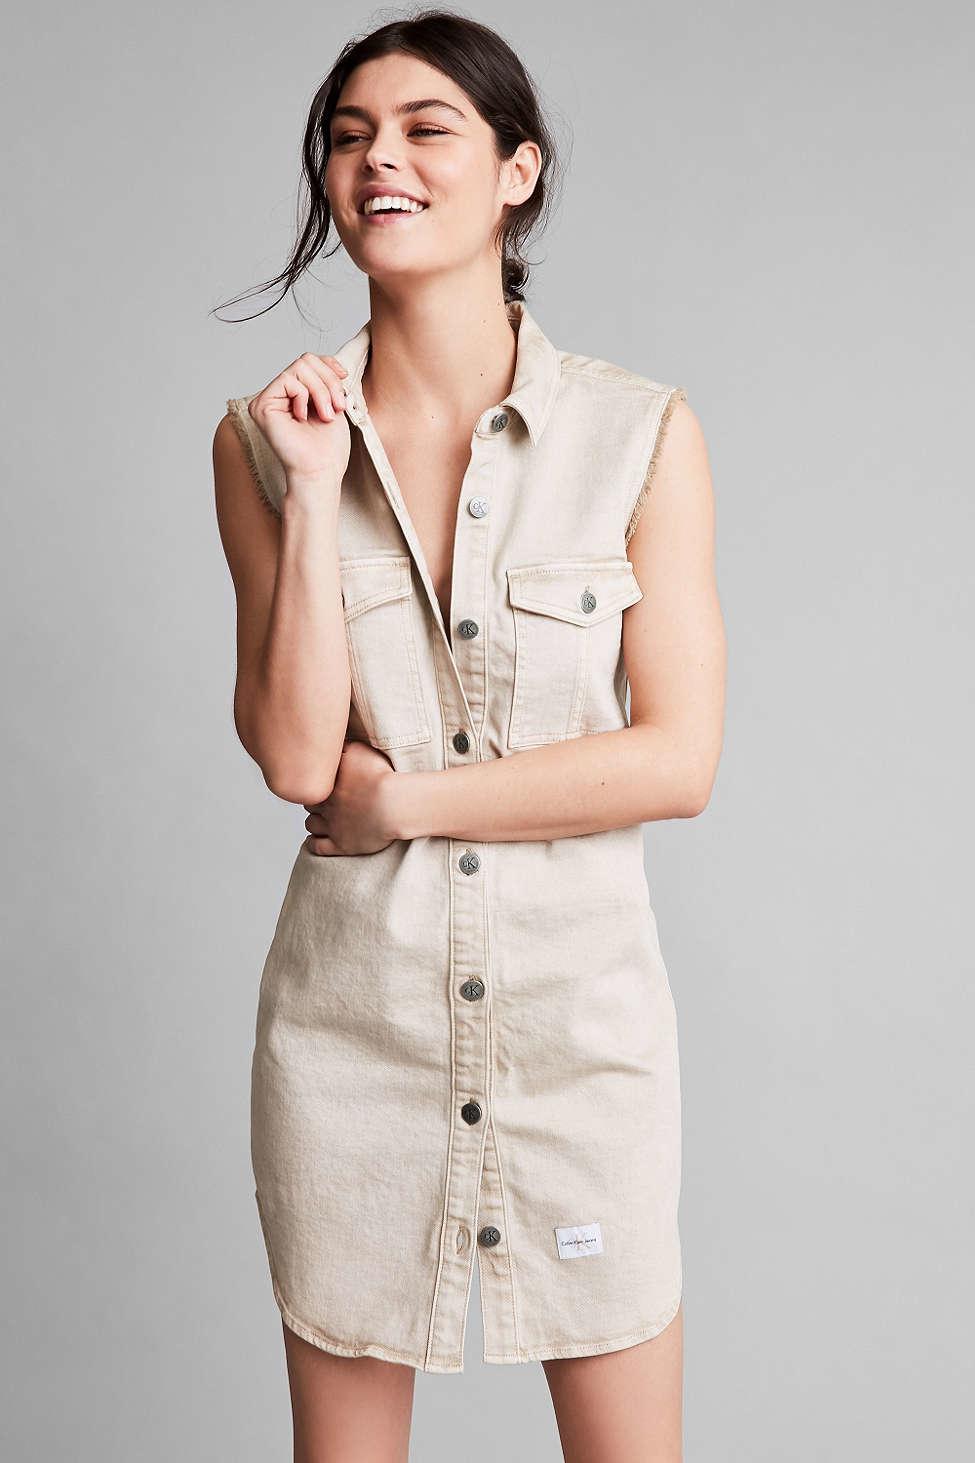 Lyst calvin klein for uo khaki sleeveless shirt dress in for Sleeveless dress shirt womens